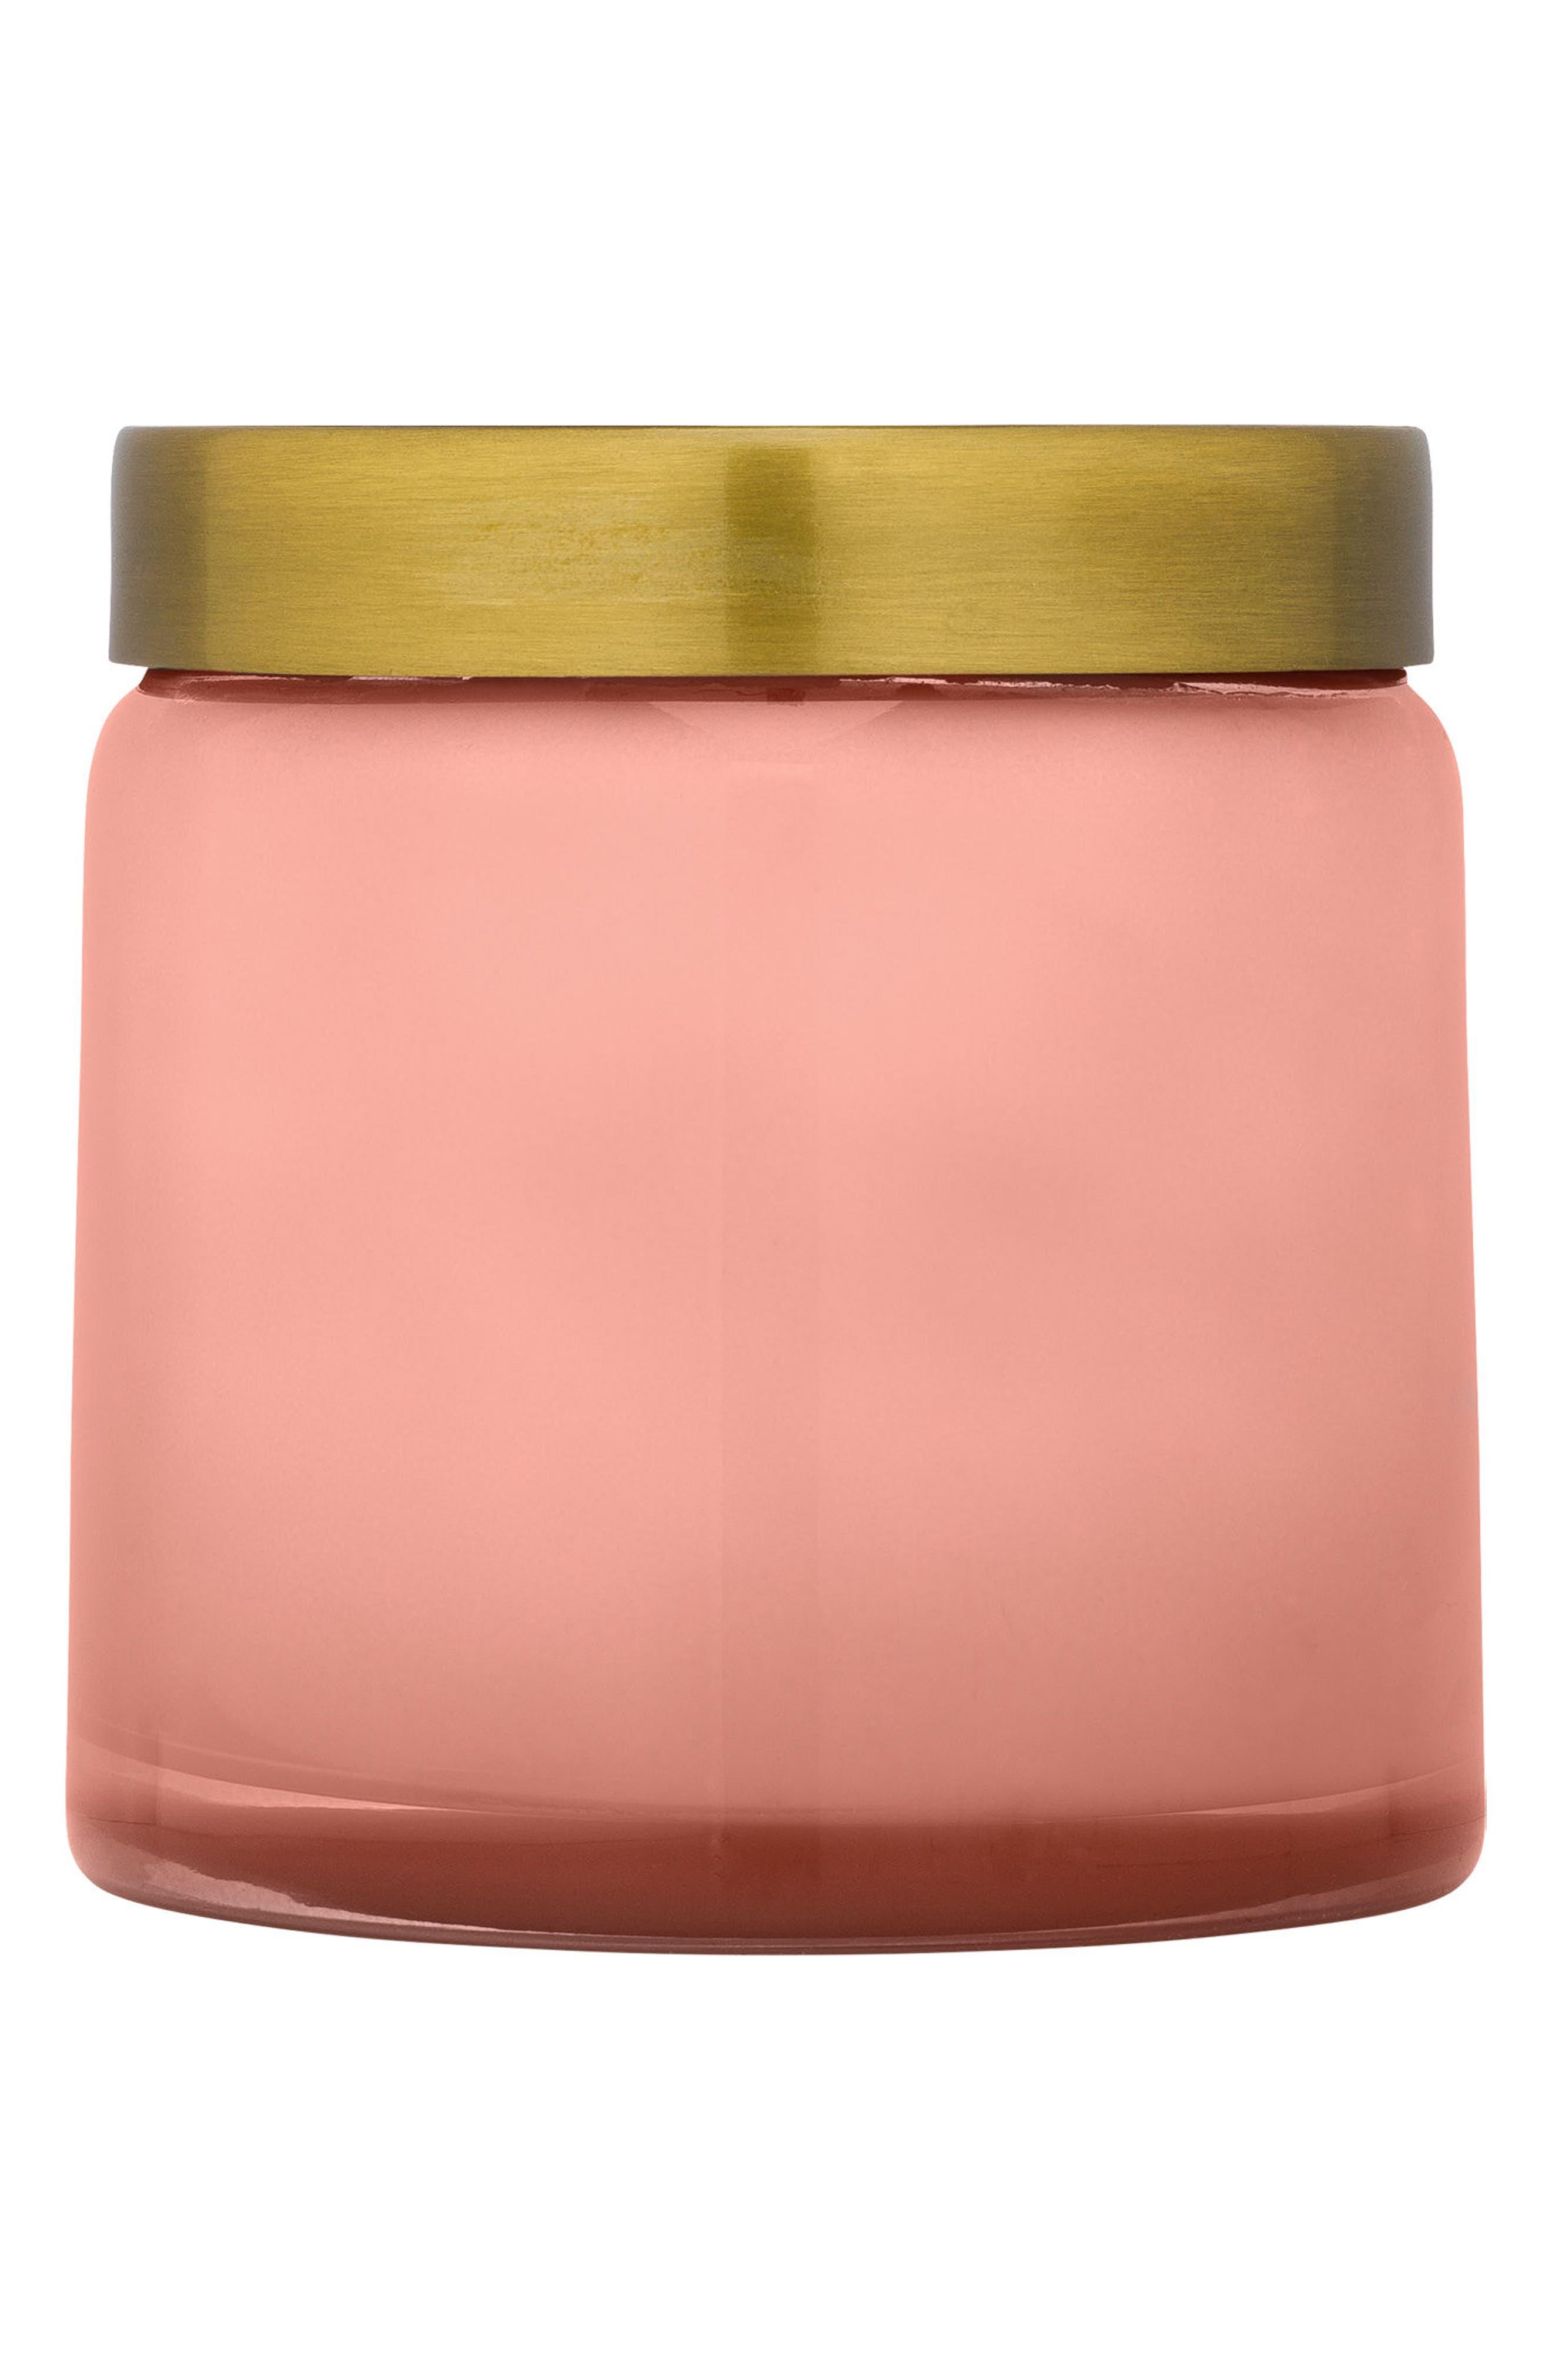 Aspen Bay Tinted Jar Candle